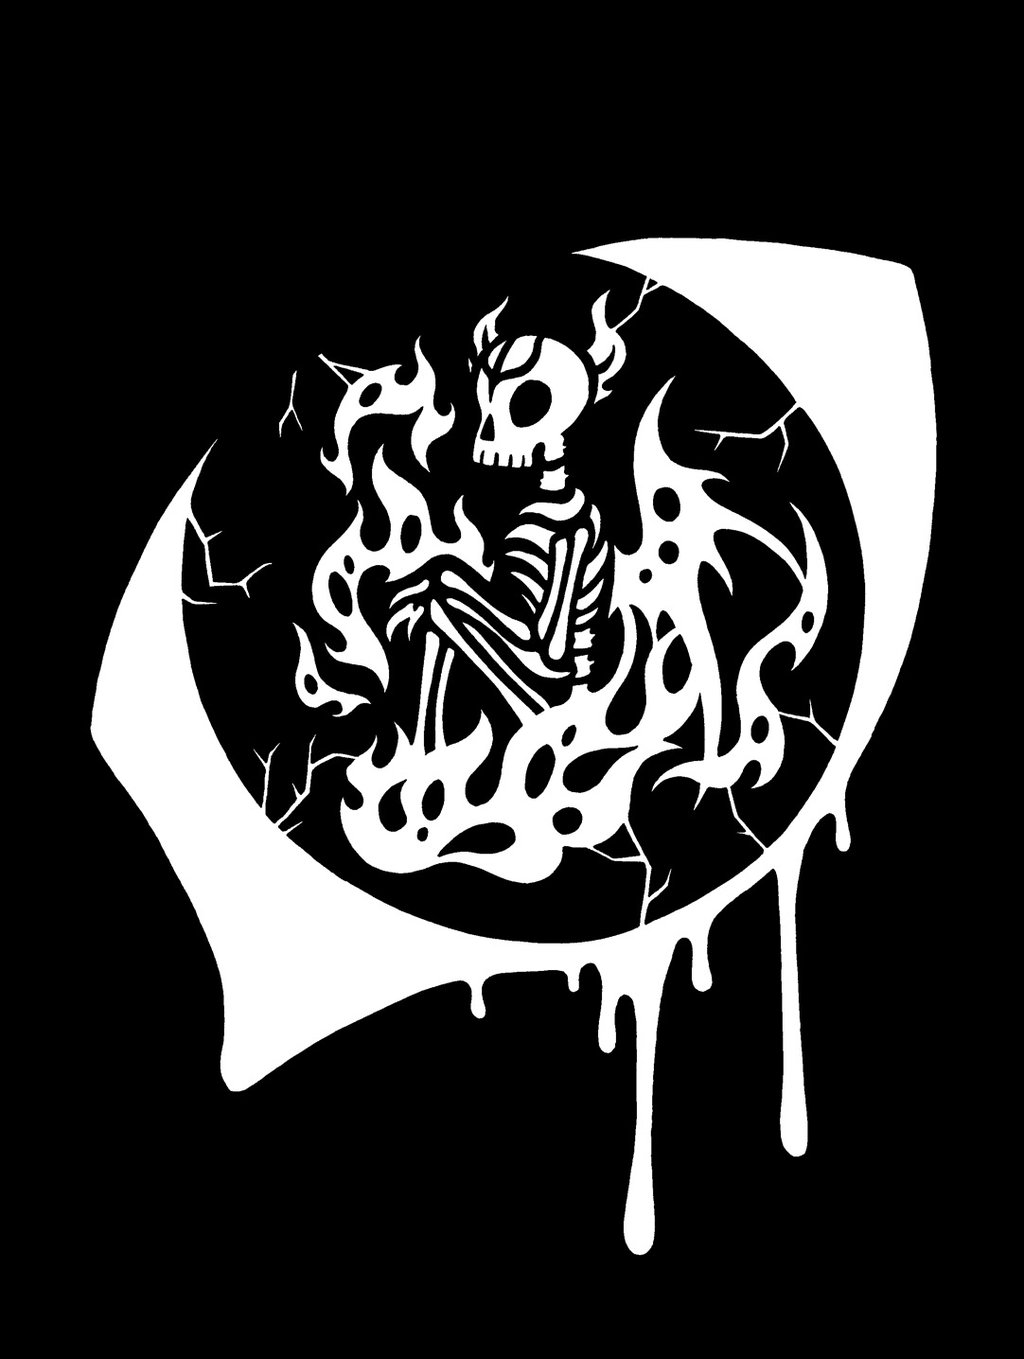 SCP-689 - 黑暗中的祟神